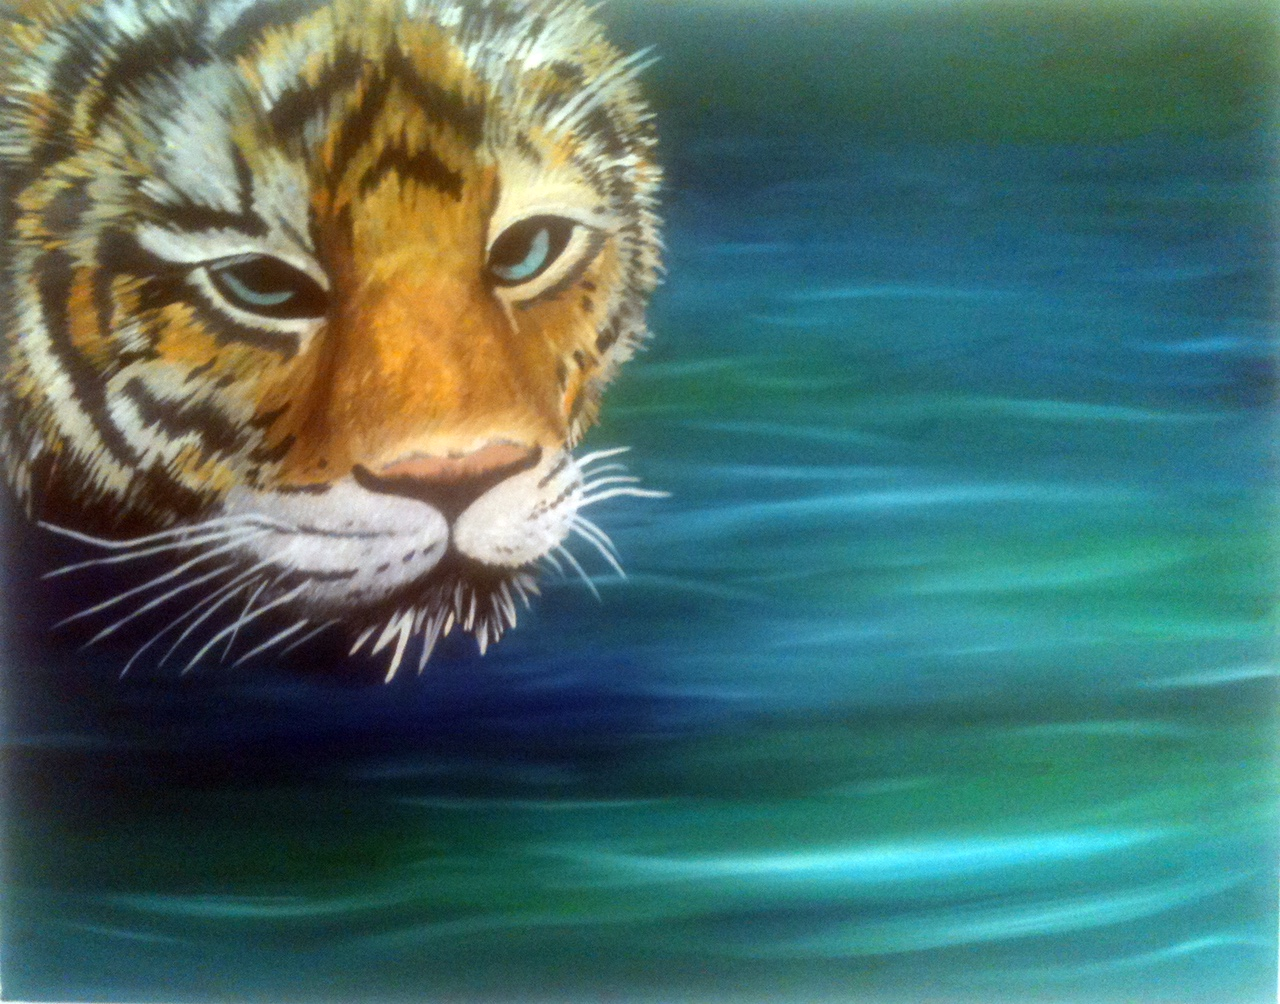 Tiger gallery image